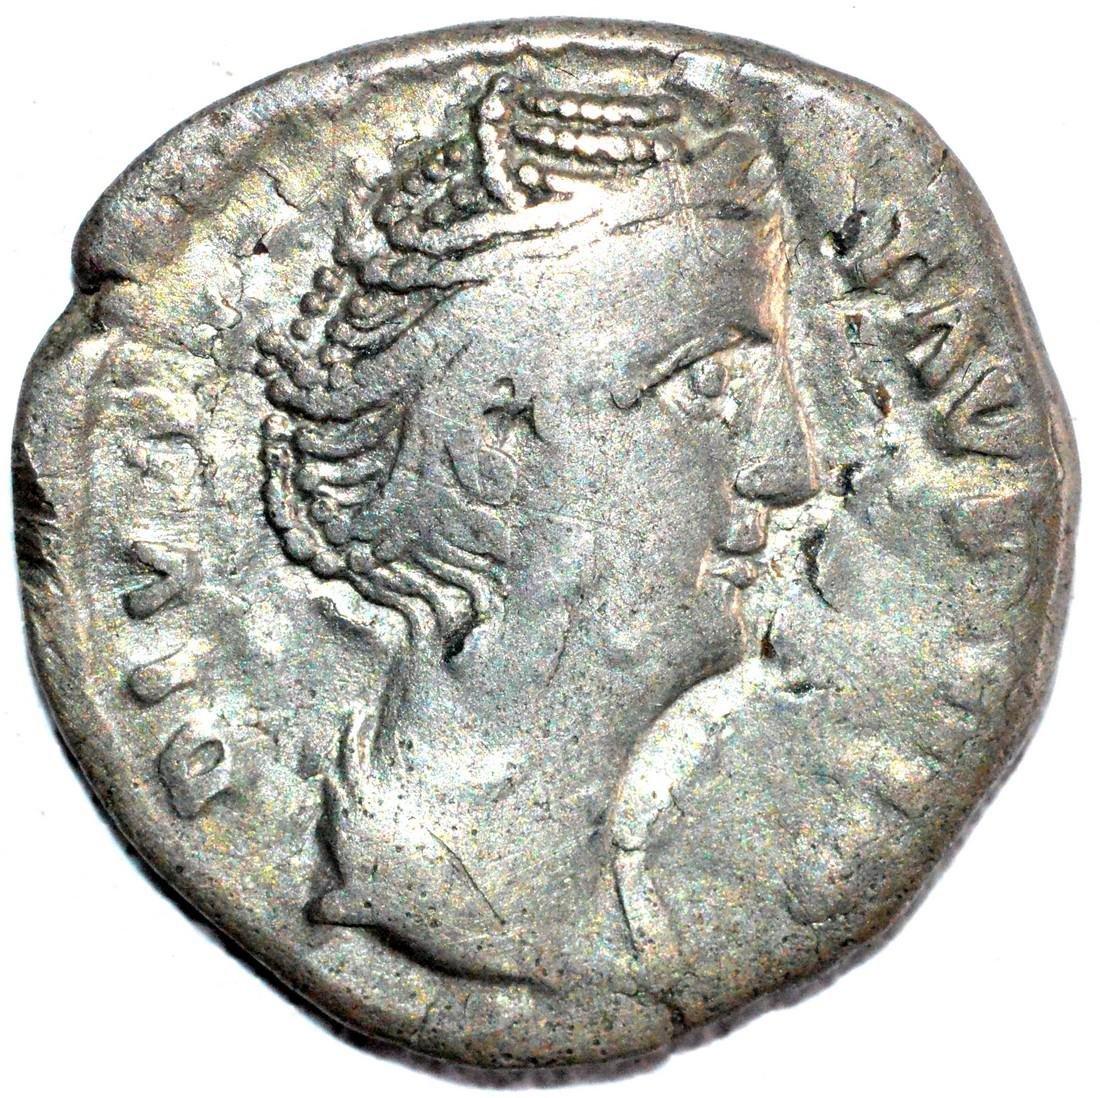 Roman Silver Denarius of Empress Faustina - rv. Avgusta